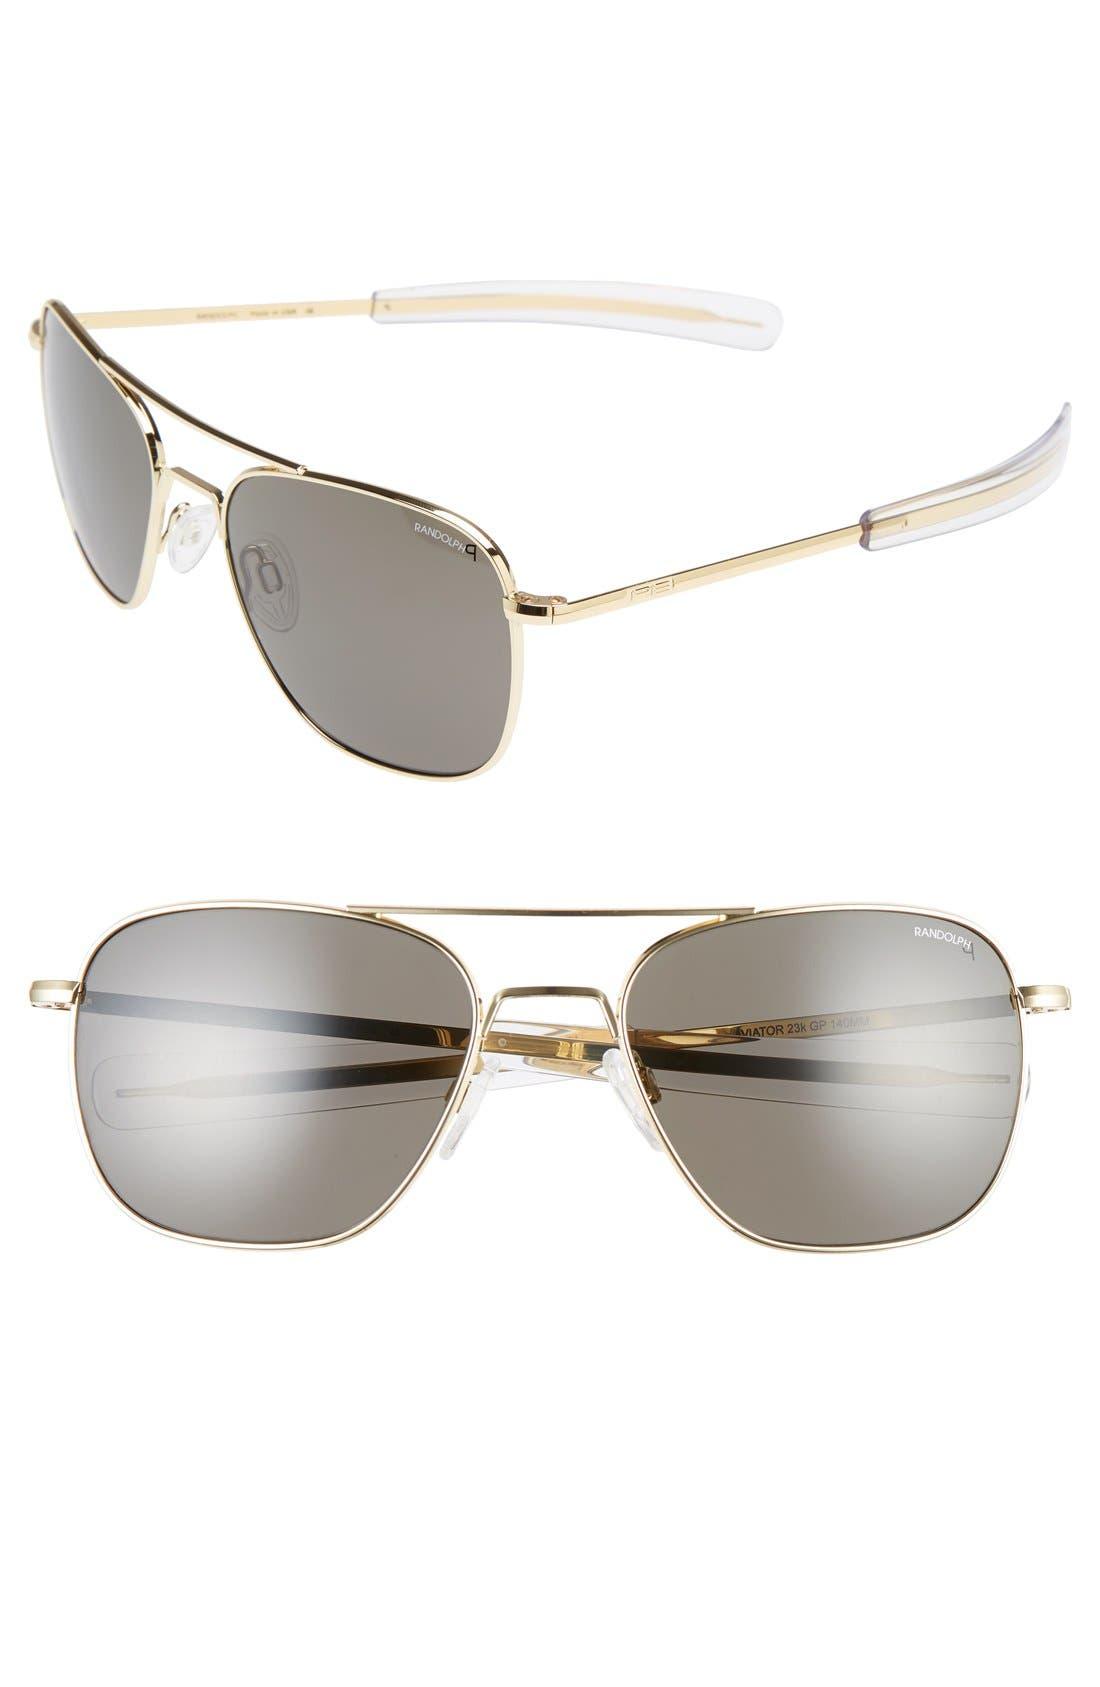 Alternate Image 1 Selected - Randolph Engineering 58mm Polarized Aviator Sunglasses